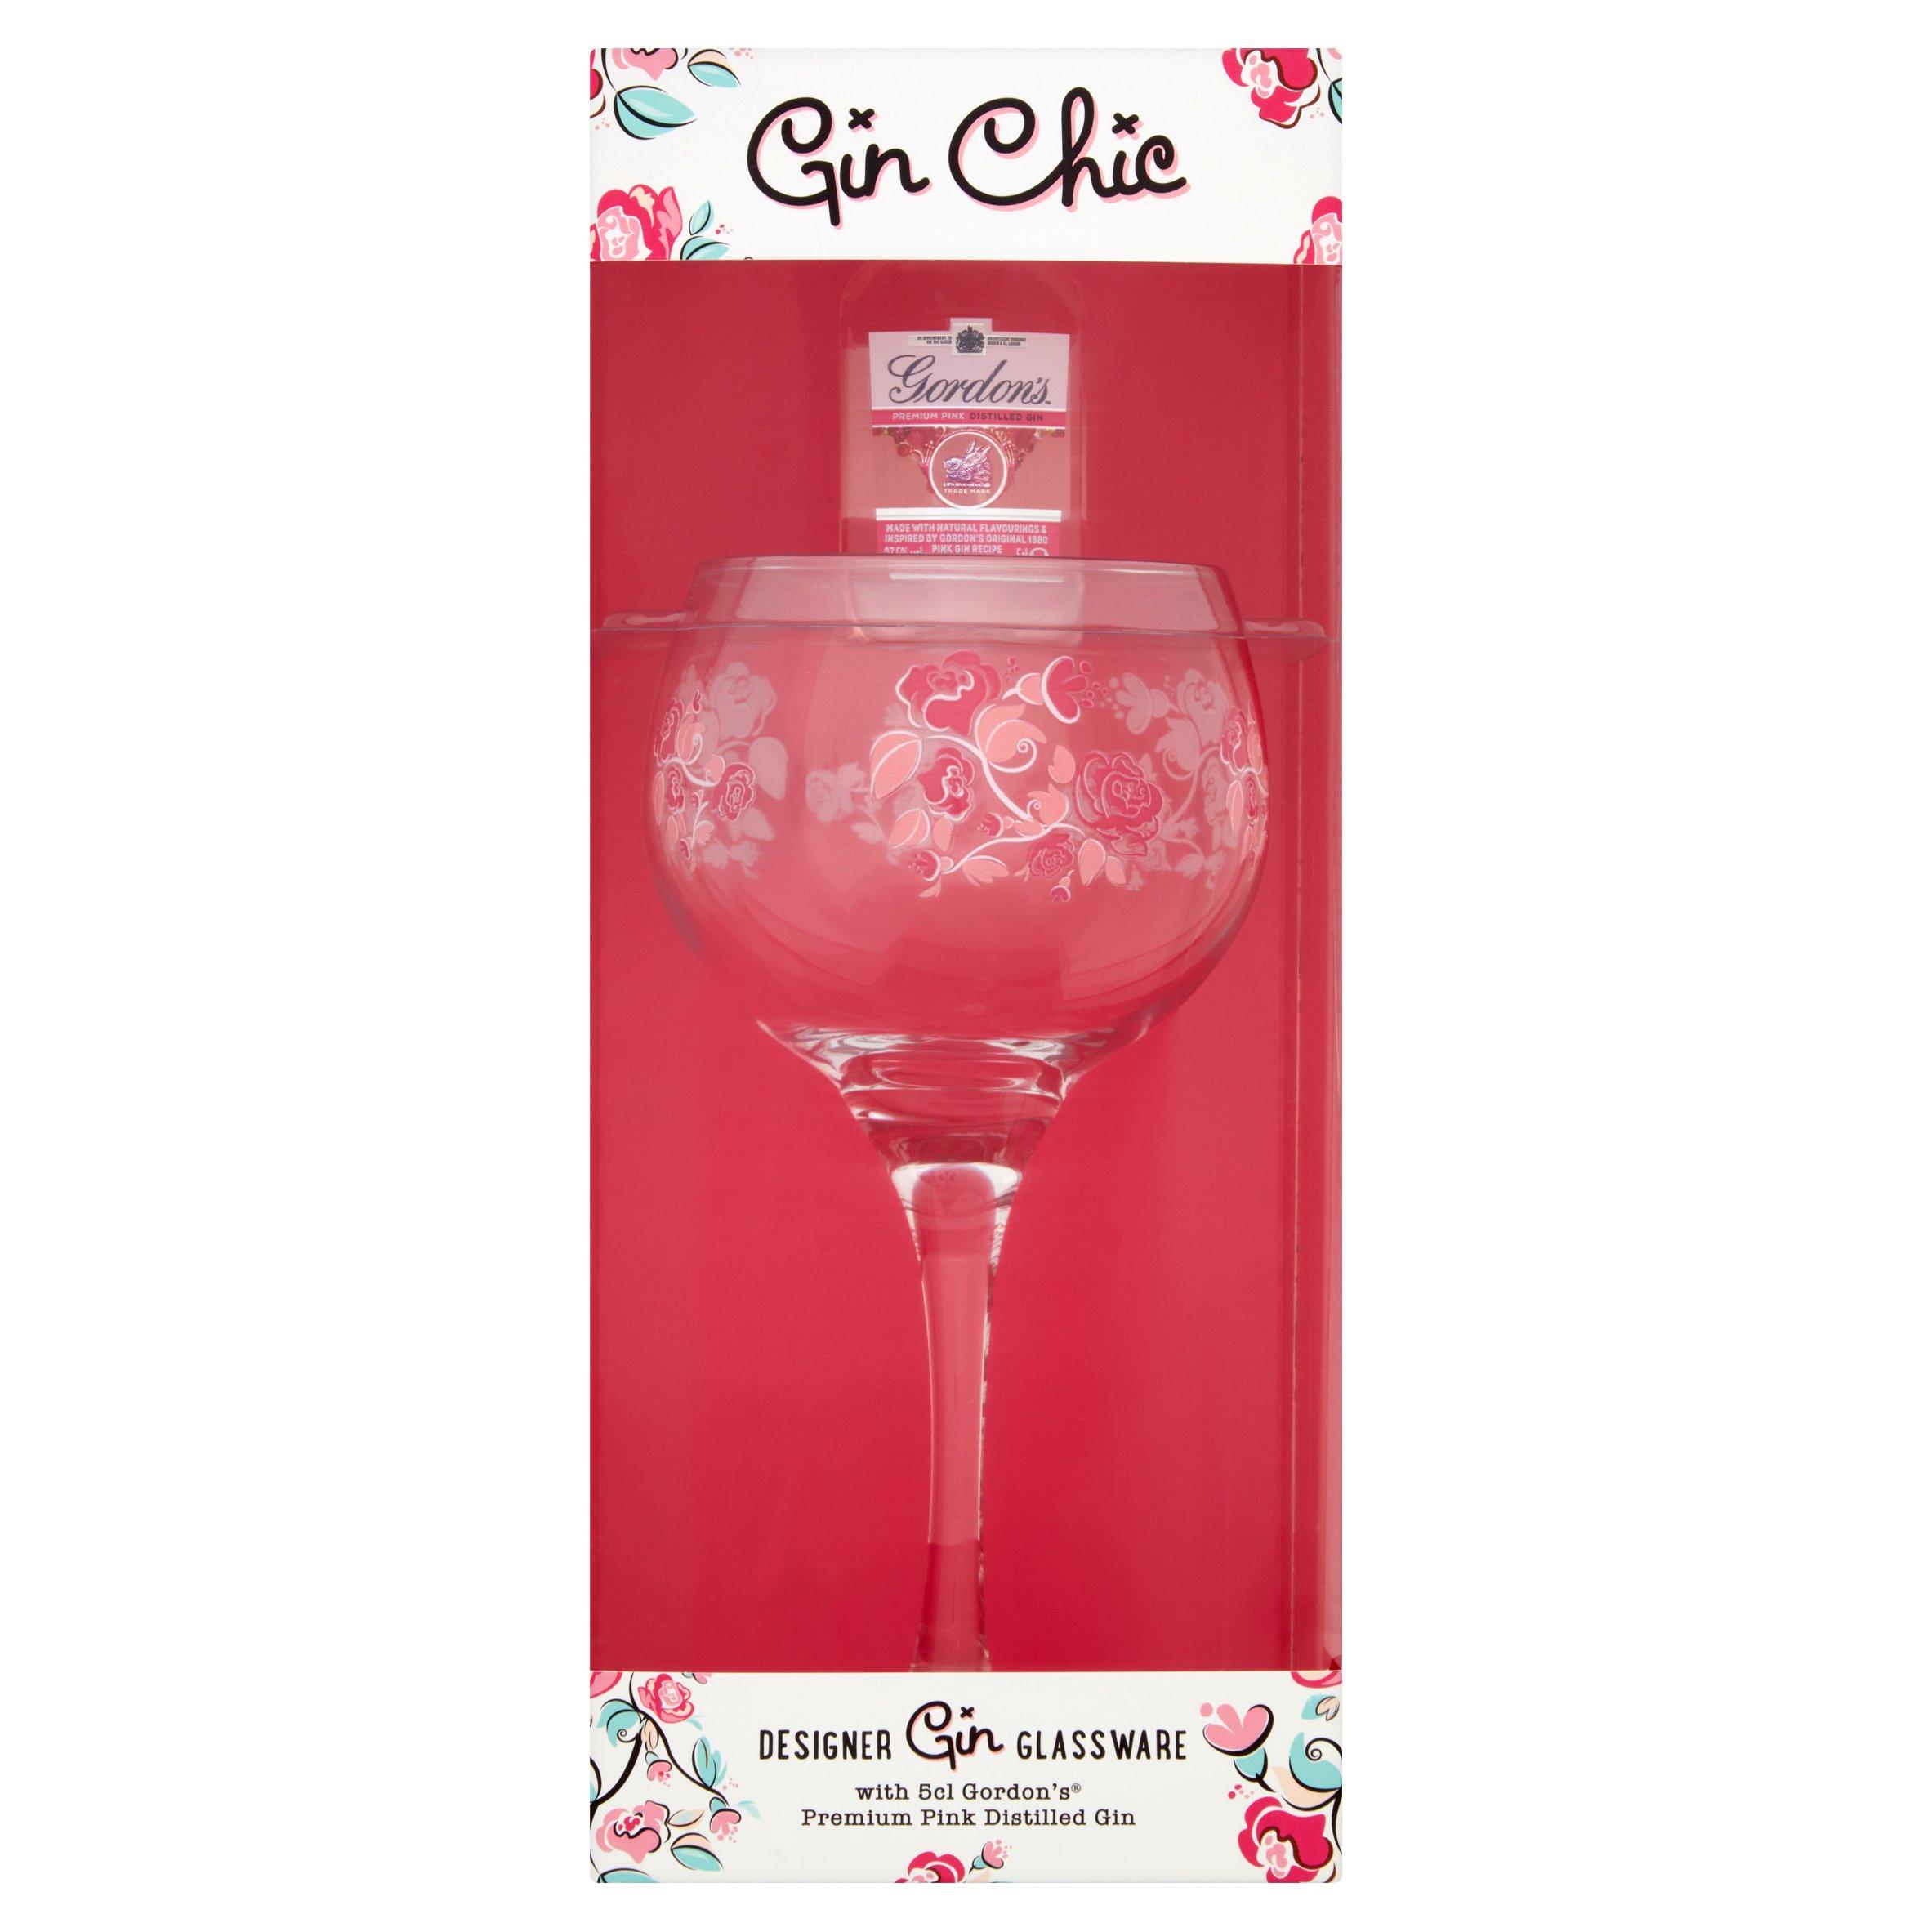 Gin Chic Glass Gift Set